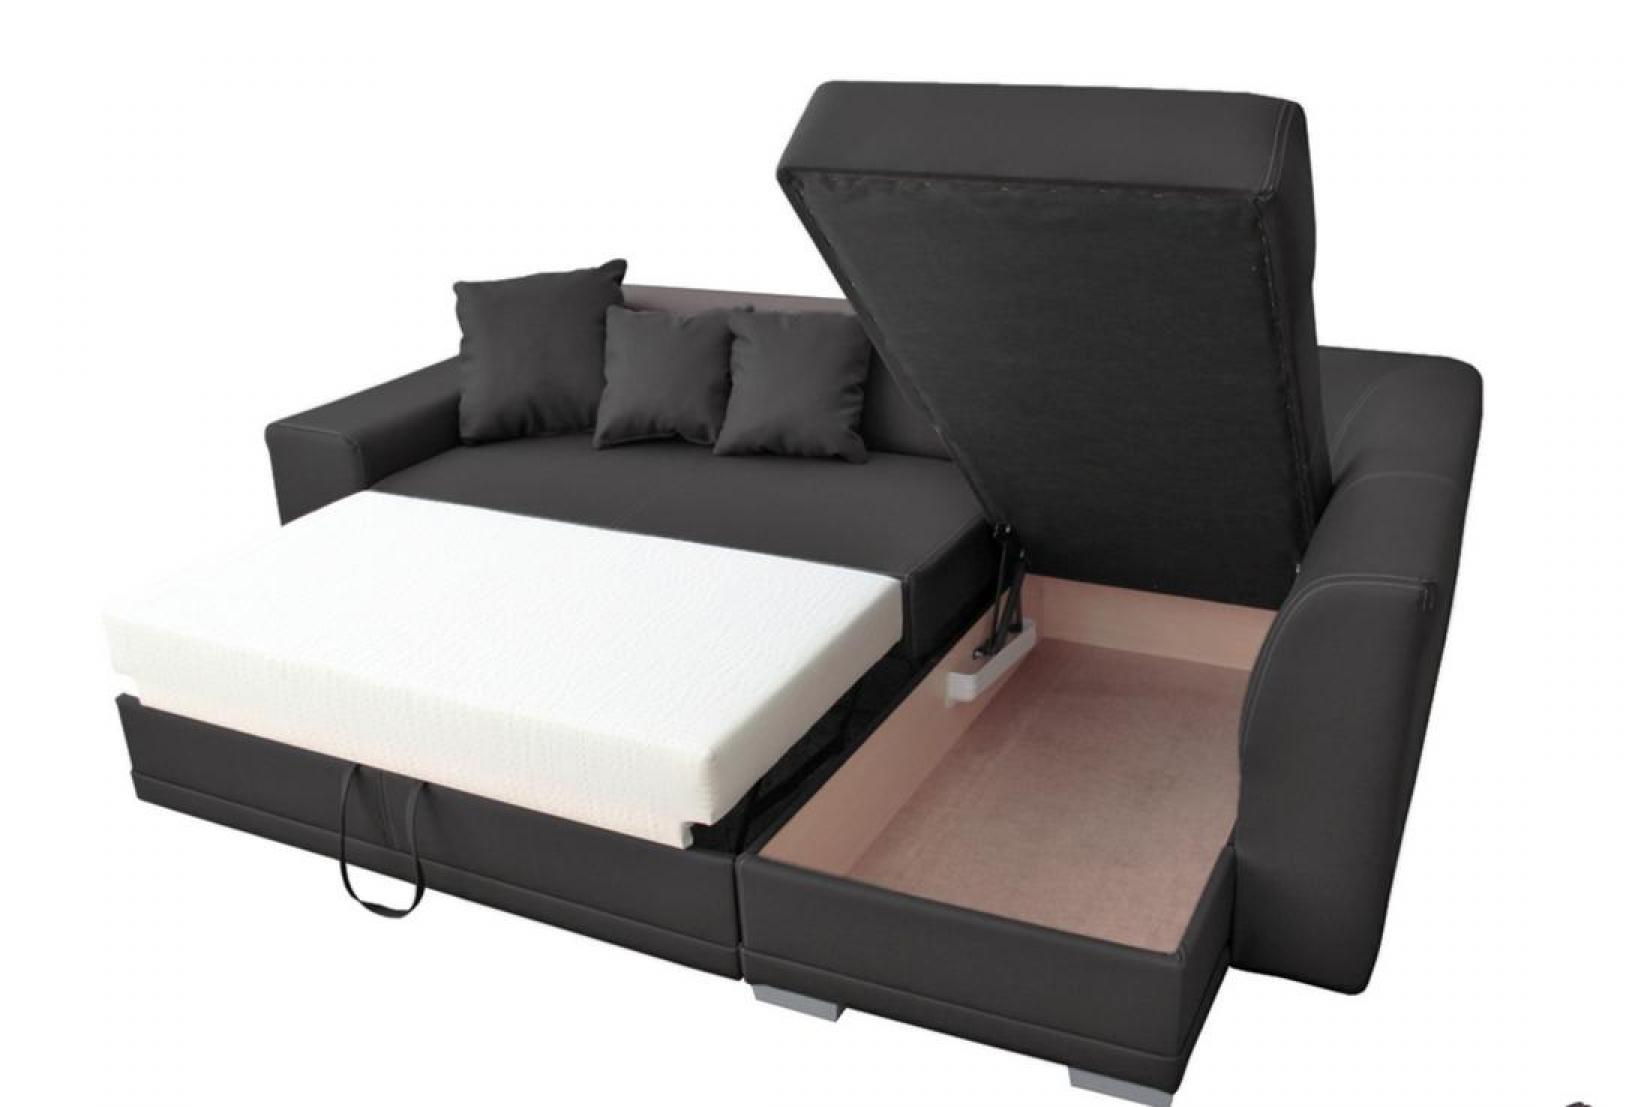 photos canap d 39 angle pas cher destockage. Black Bedroom Furniture Sets. Home Design Ideas